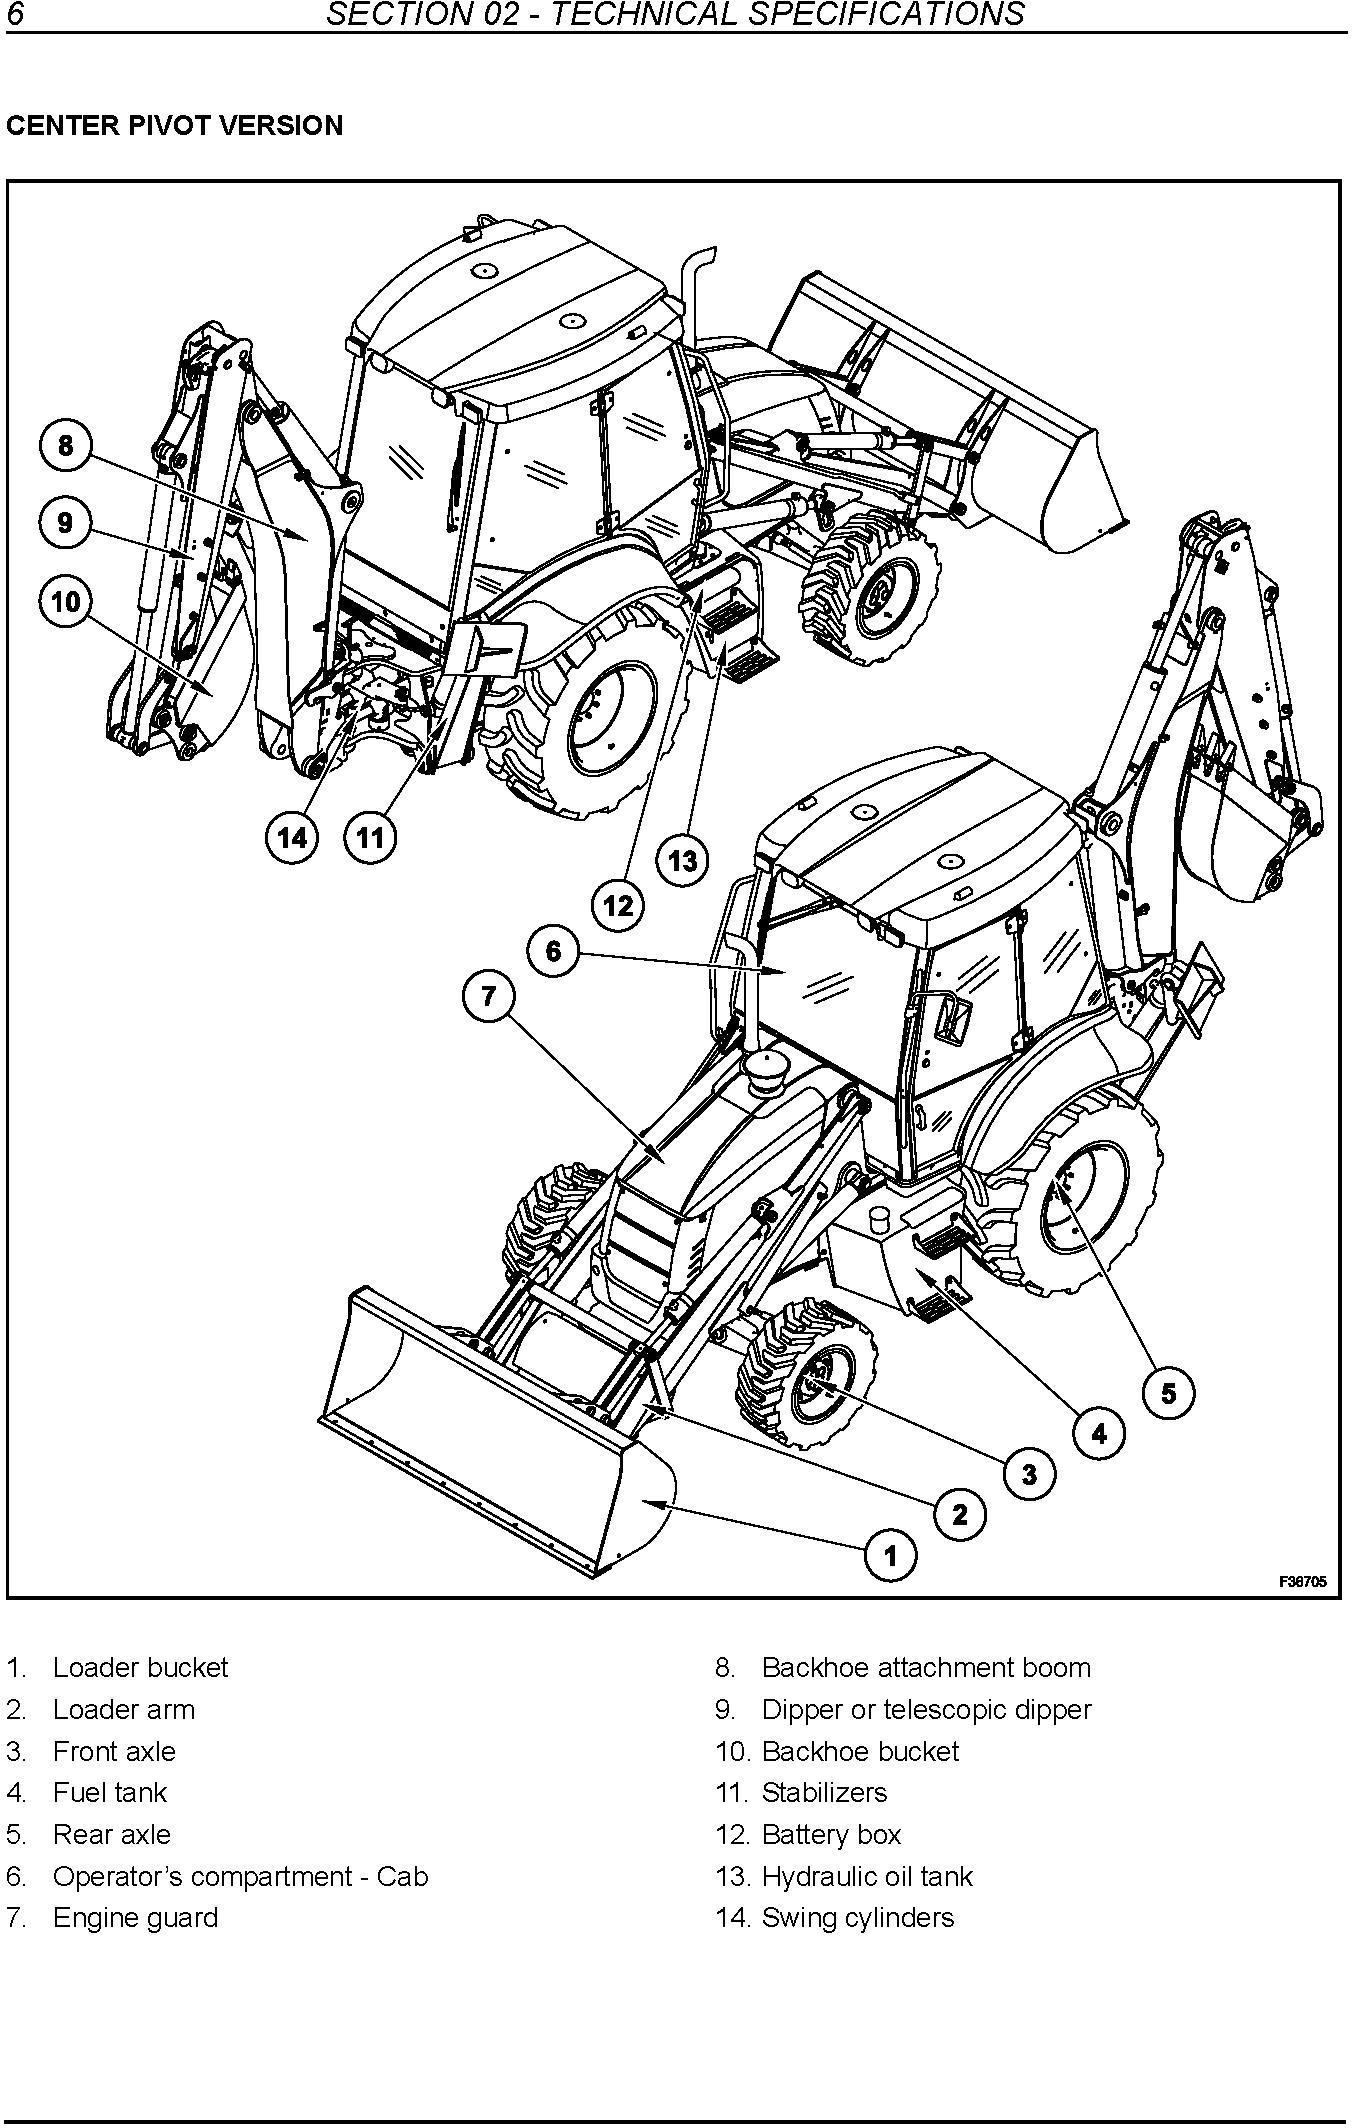 New Holland B90B /BLR, B100B /BLR, B100BTC, B110B /BTC, B115B Tier 3 Backhoe Loaders Service Manual - 1